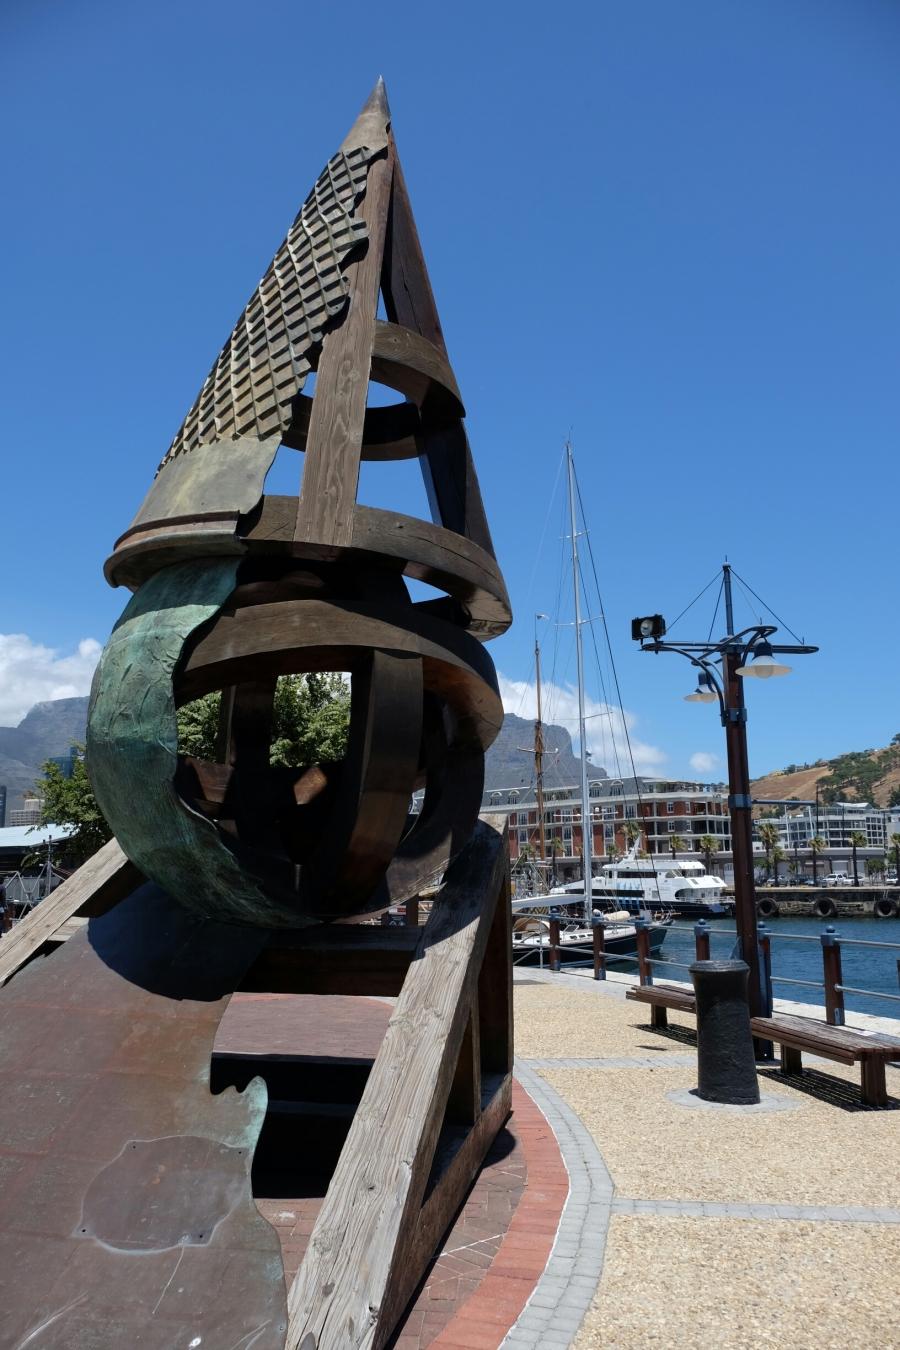 Kunstwerk in V&A Waterfront in Kapstadt